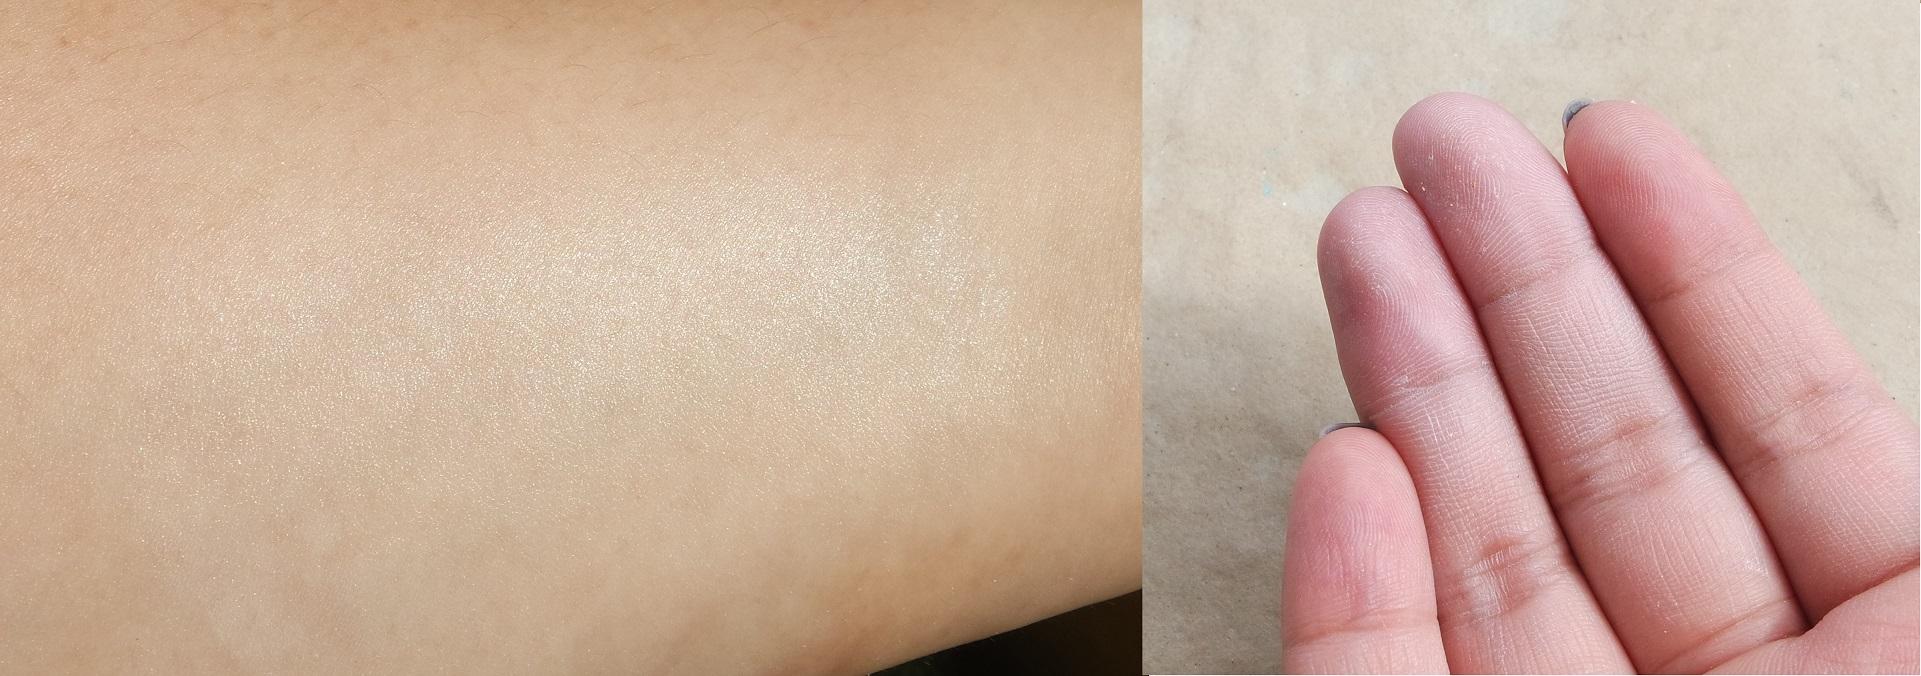 Instantly Brighter Skin